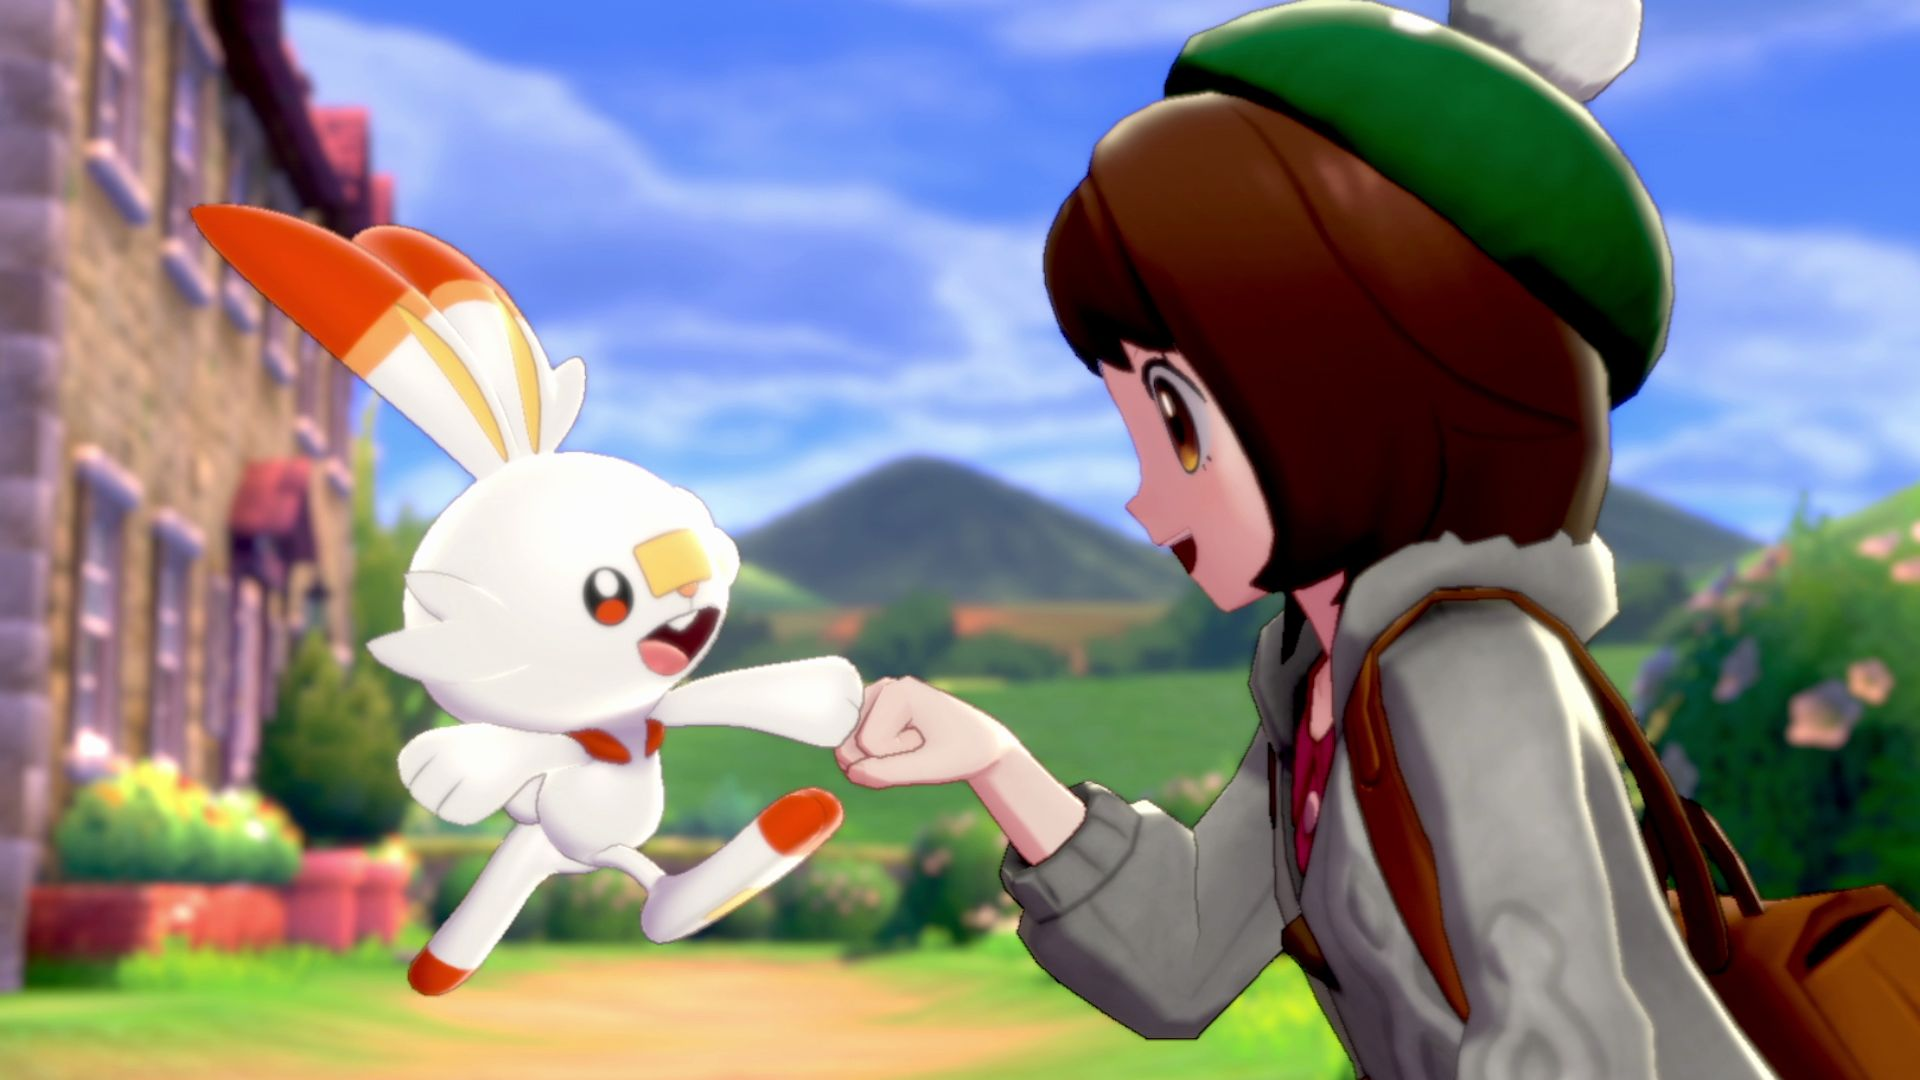 Dynamaxing a corgi in 'Pokémon Sword' and 'Shield'